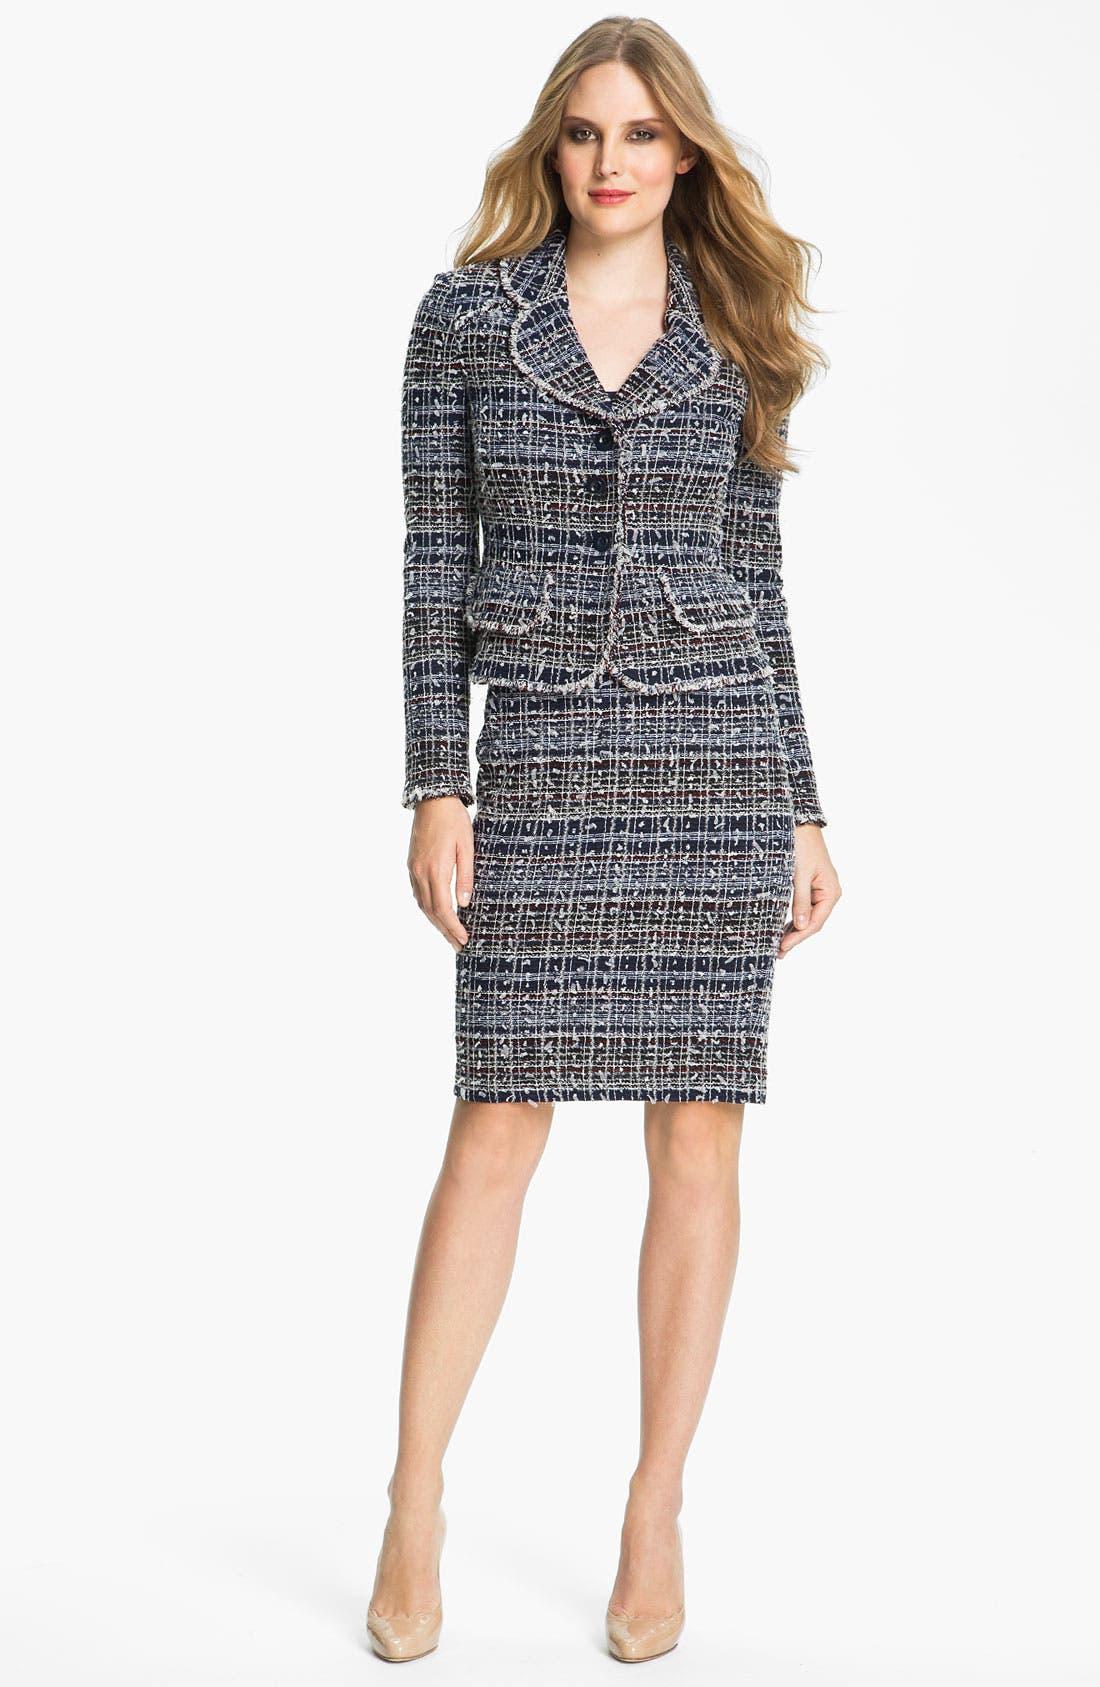 Main Image - St. John Collection 'Sutton' Tweed Knit Jacket